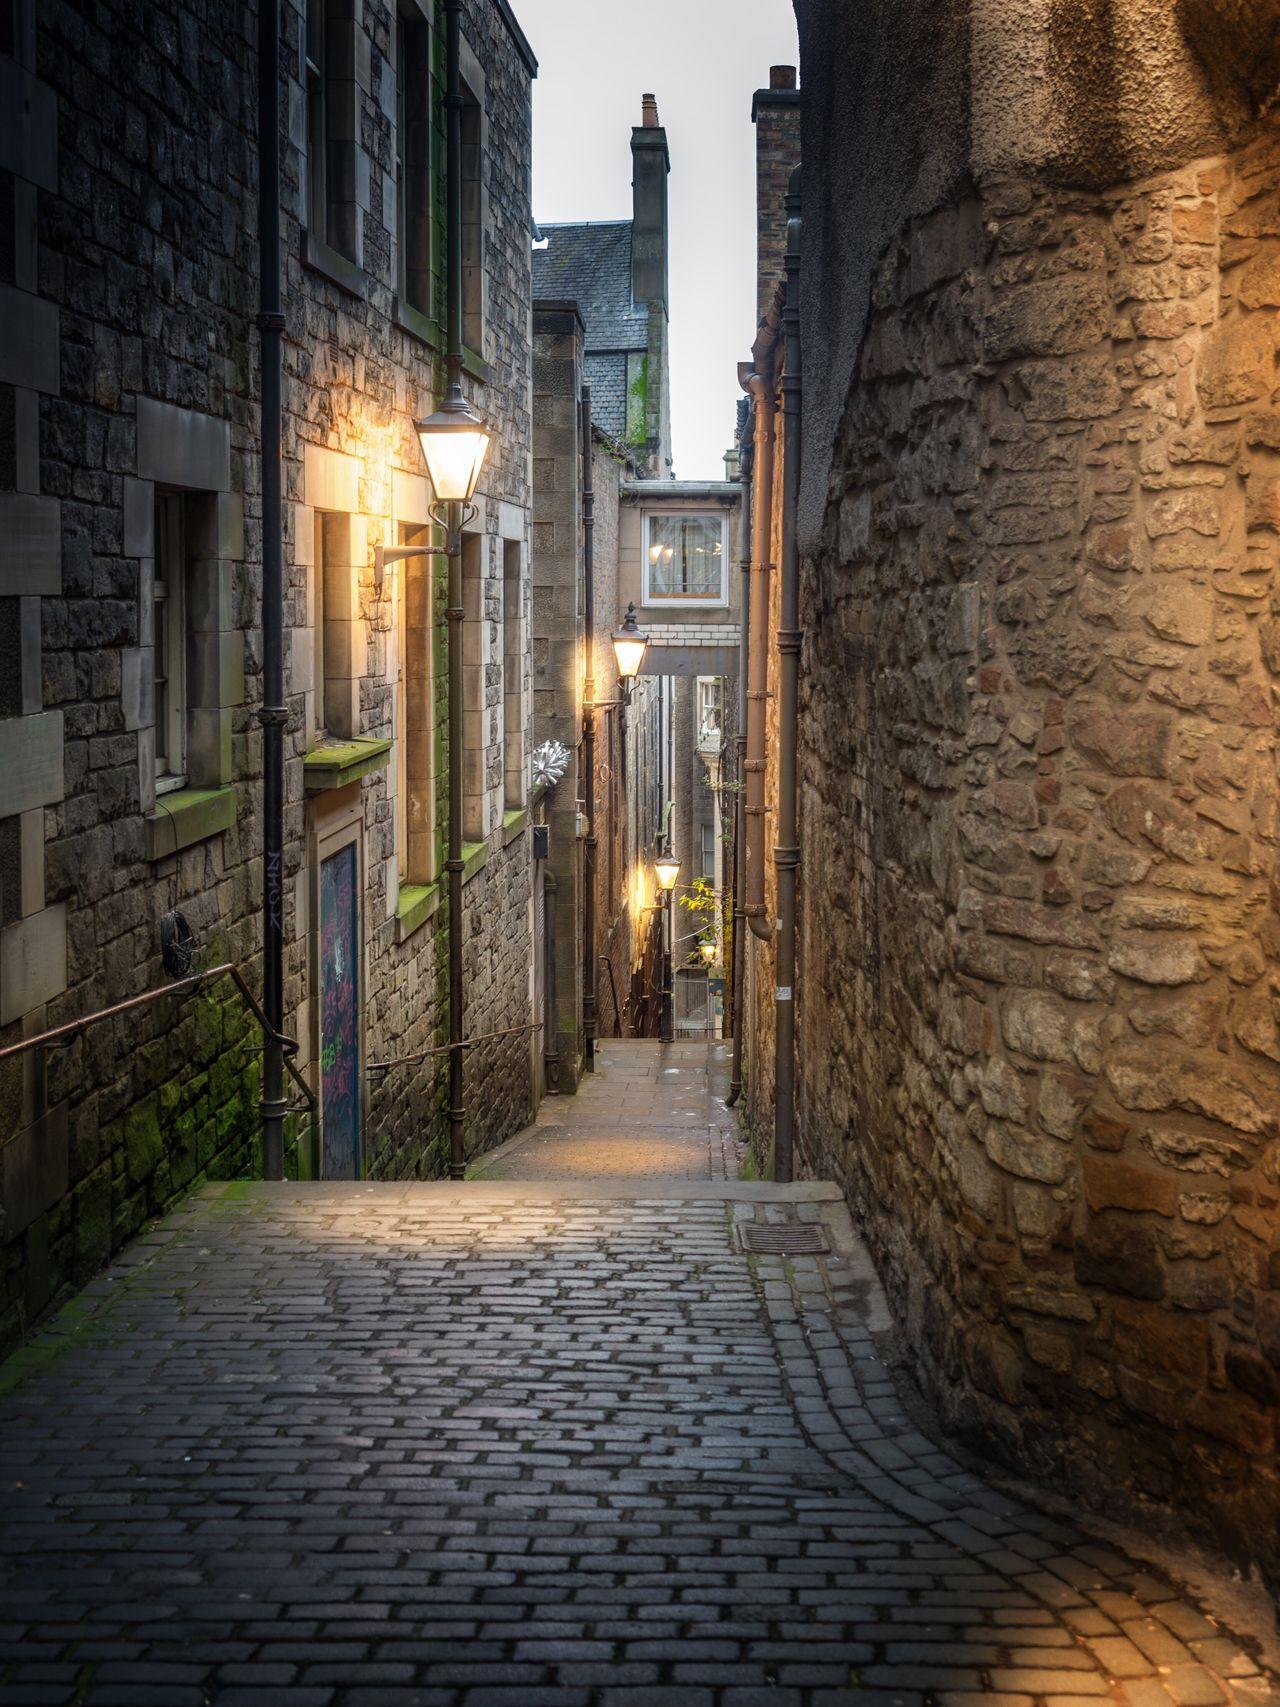 Illuminated City Alley Alleyway Medieval Scotland Edinburgh Europe Europe Trip Light And Shadow Lights Old Town No People Architecture The Way Forward Edinburgh, Scotland Moose United Kingdom Great Britain Scottish